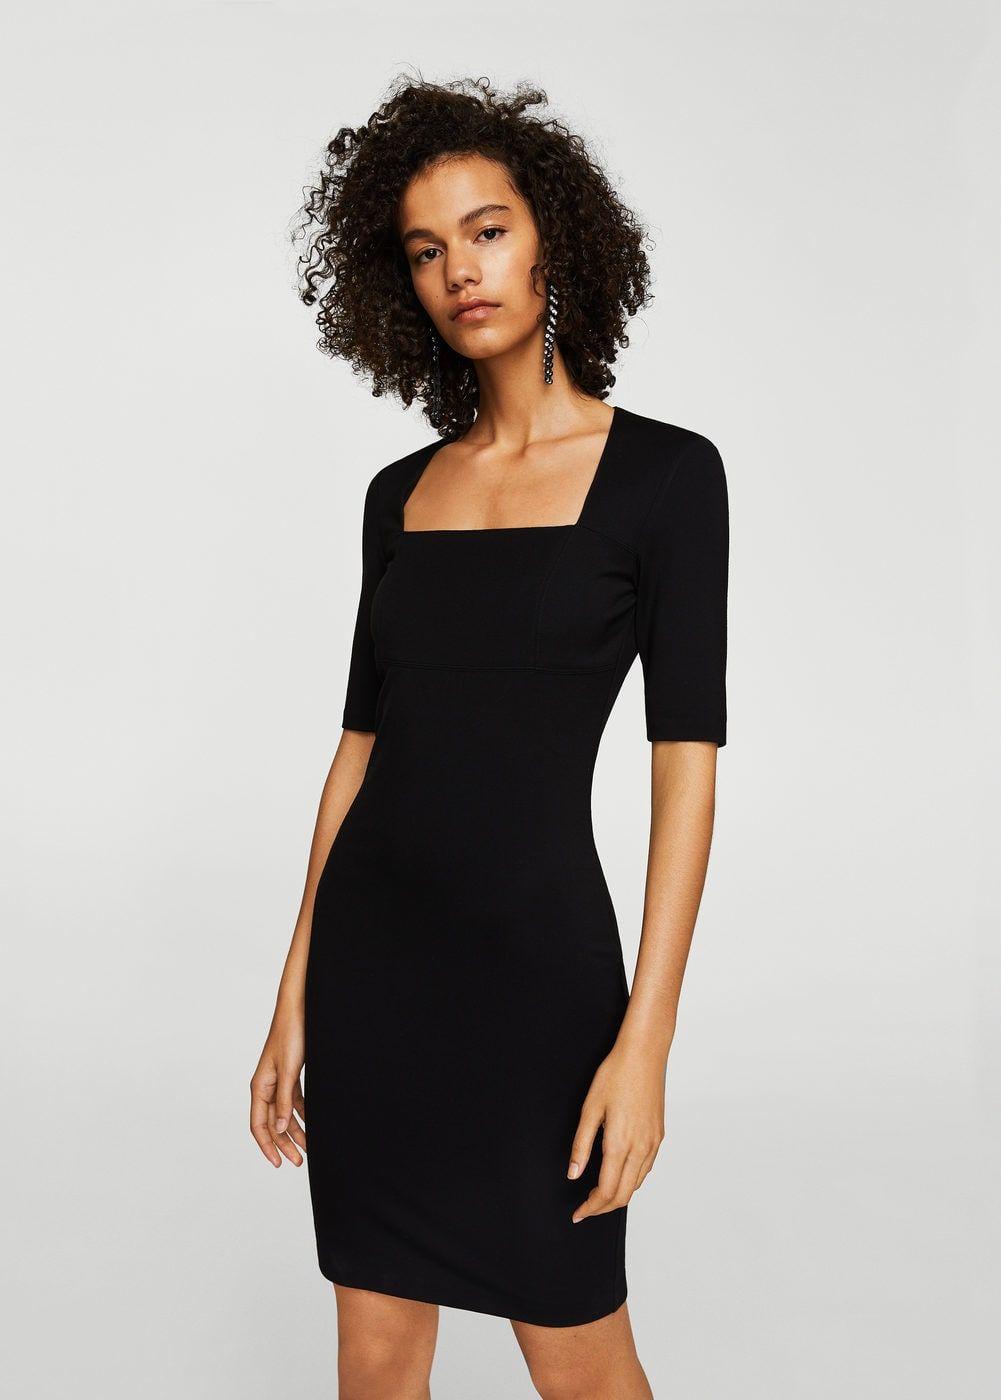 Vestido escote cuadrado - Vestidos de Mujer ad4880a259e2